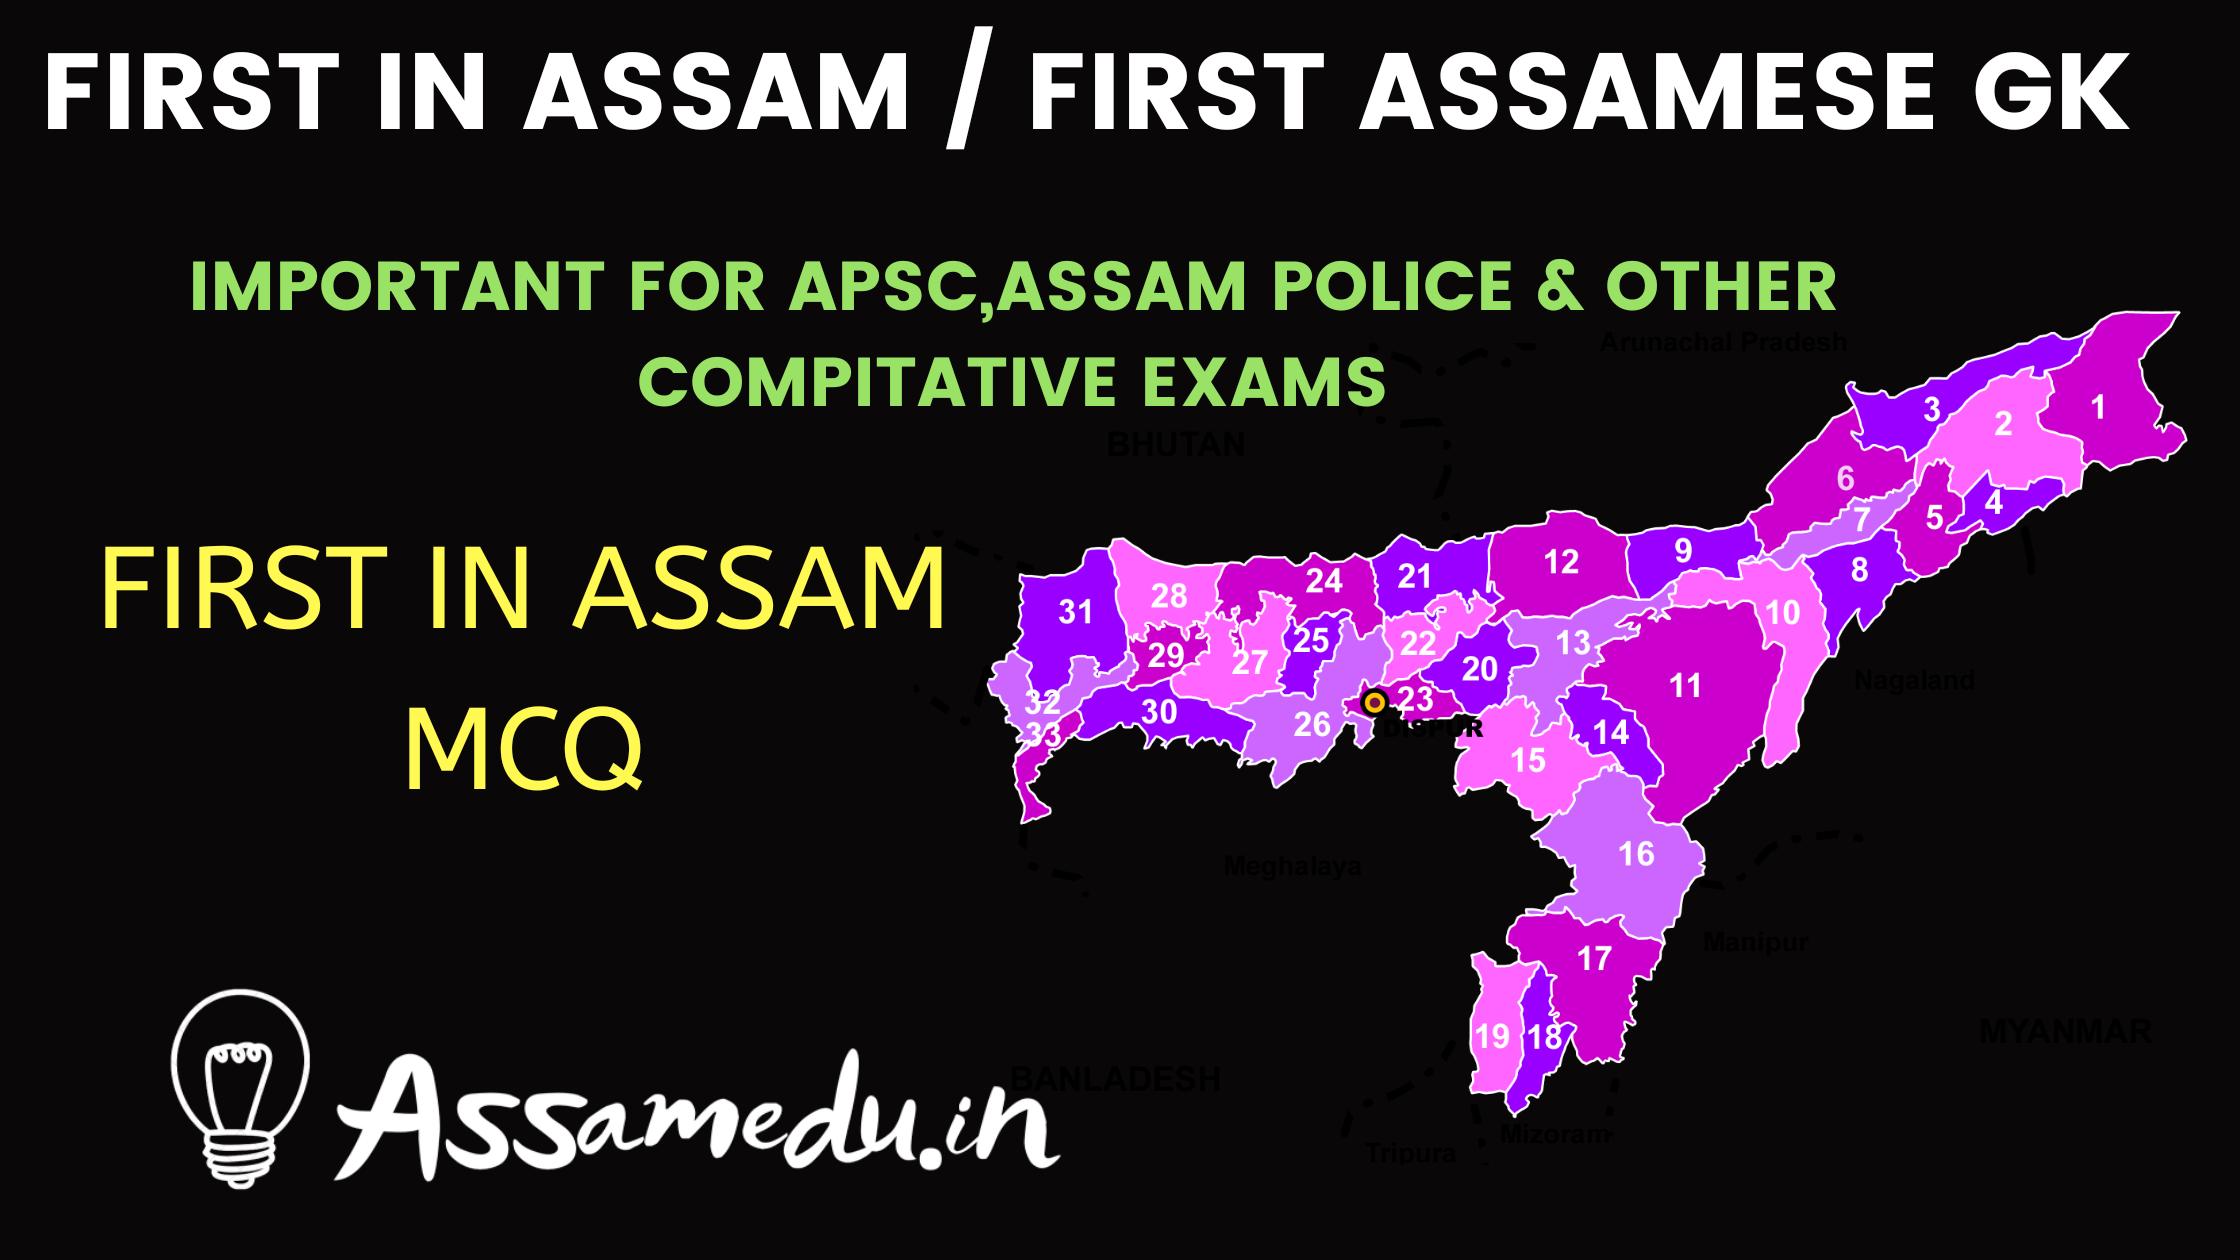 First in Assam Gk